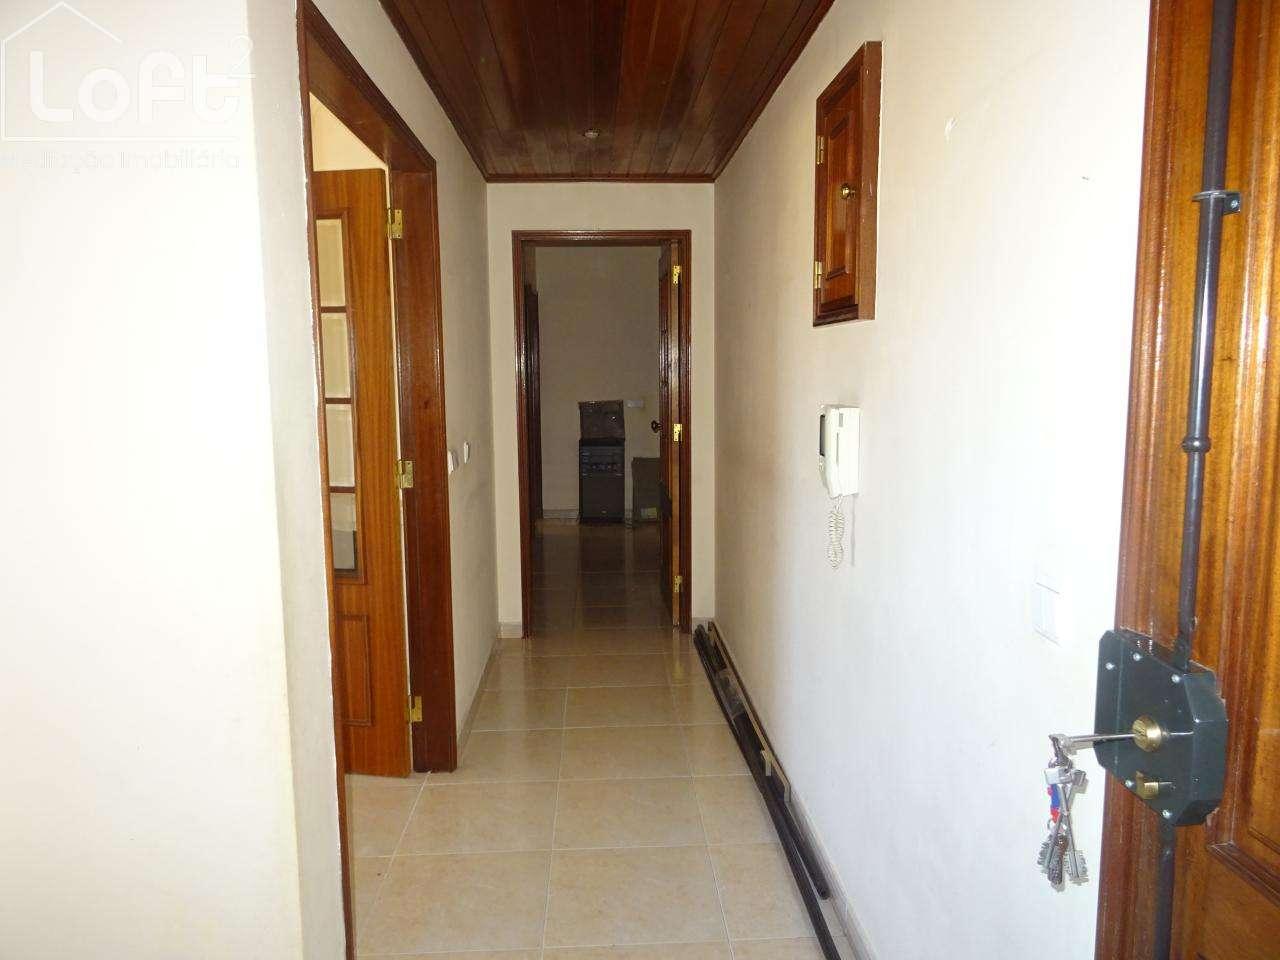 Apartamento para comprar, Porto Salvo, Oeiras, Lisboa - Foto 7